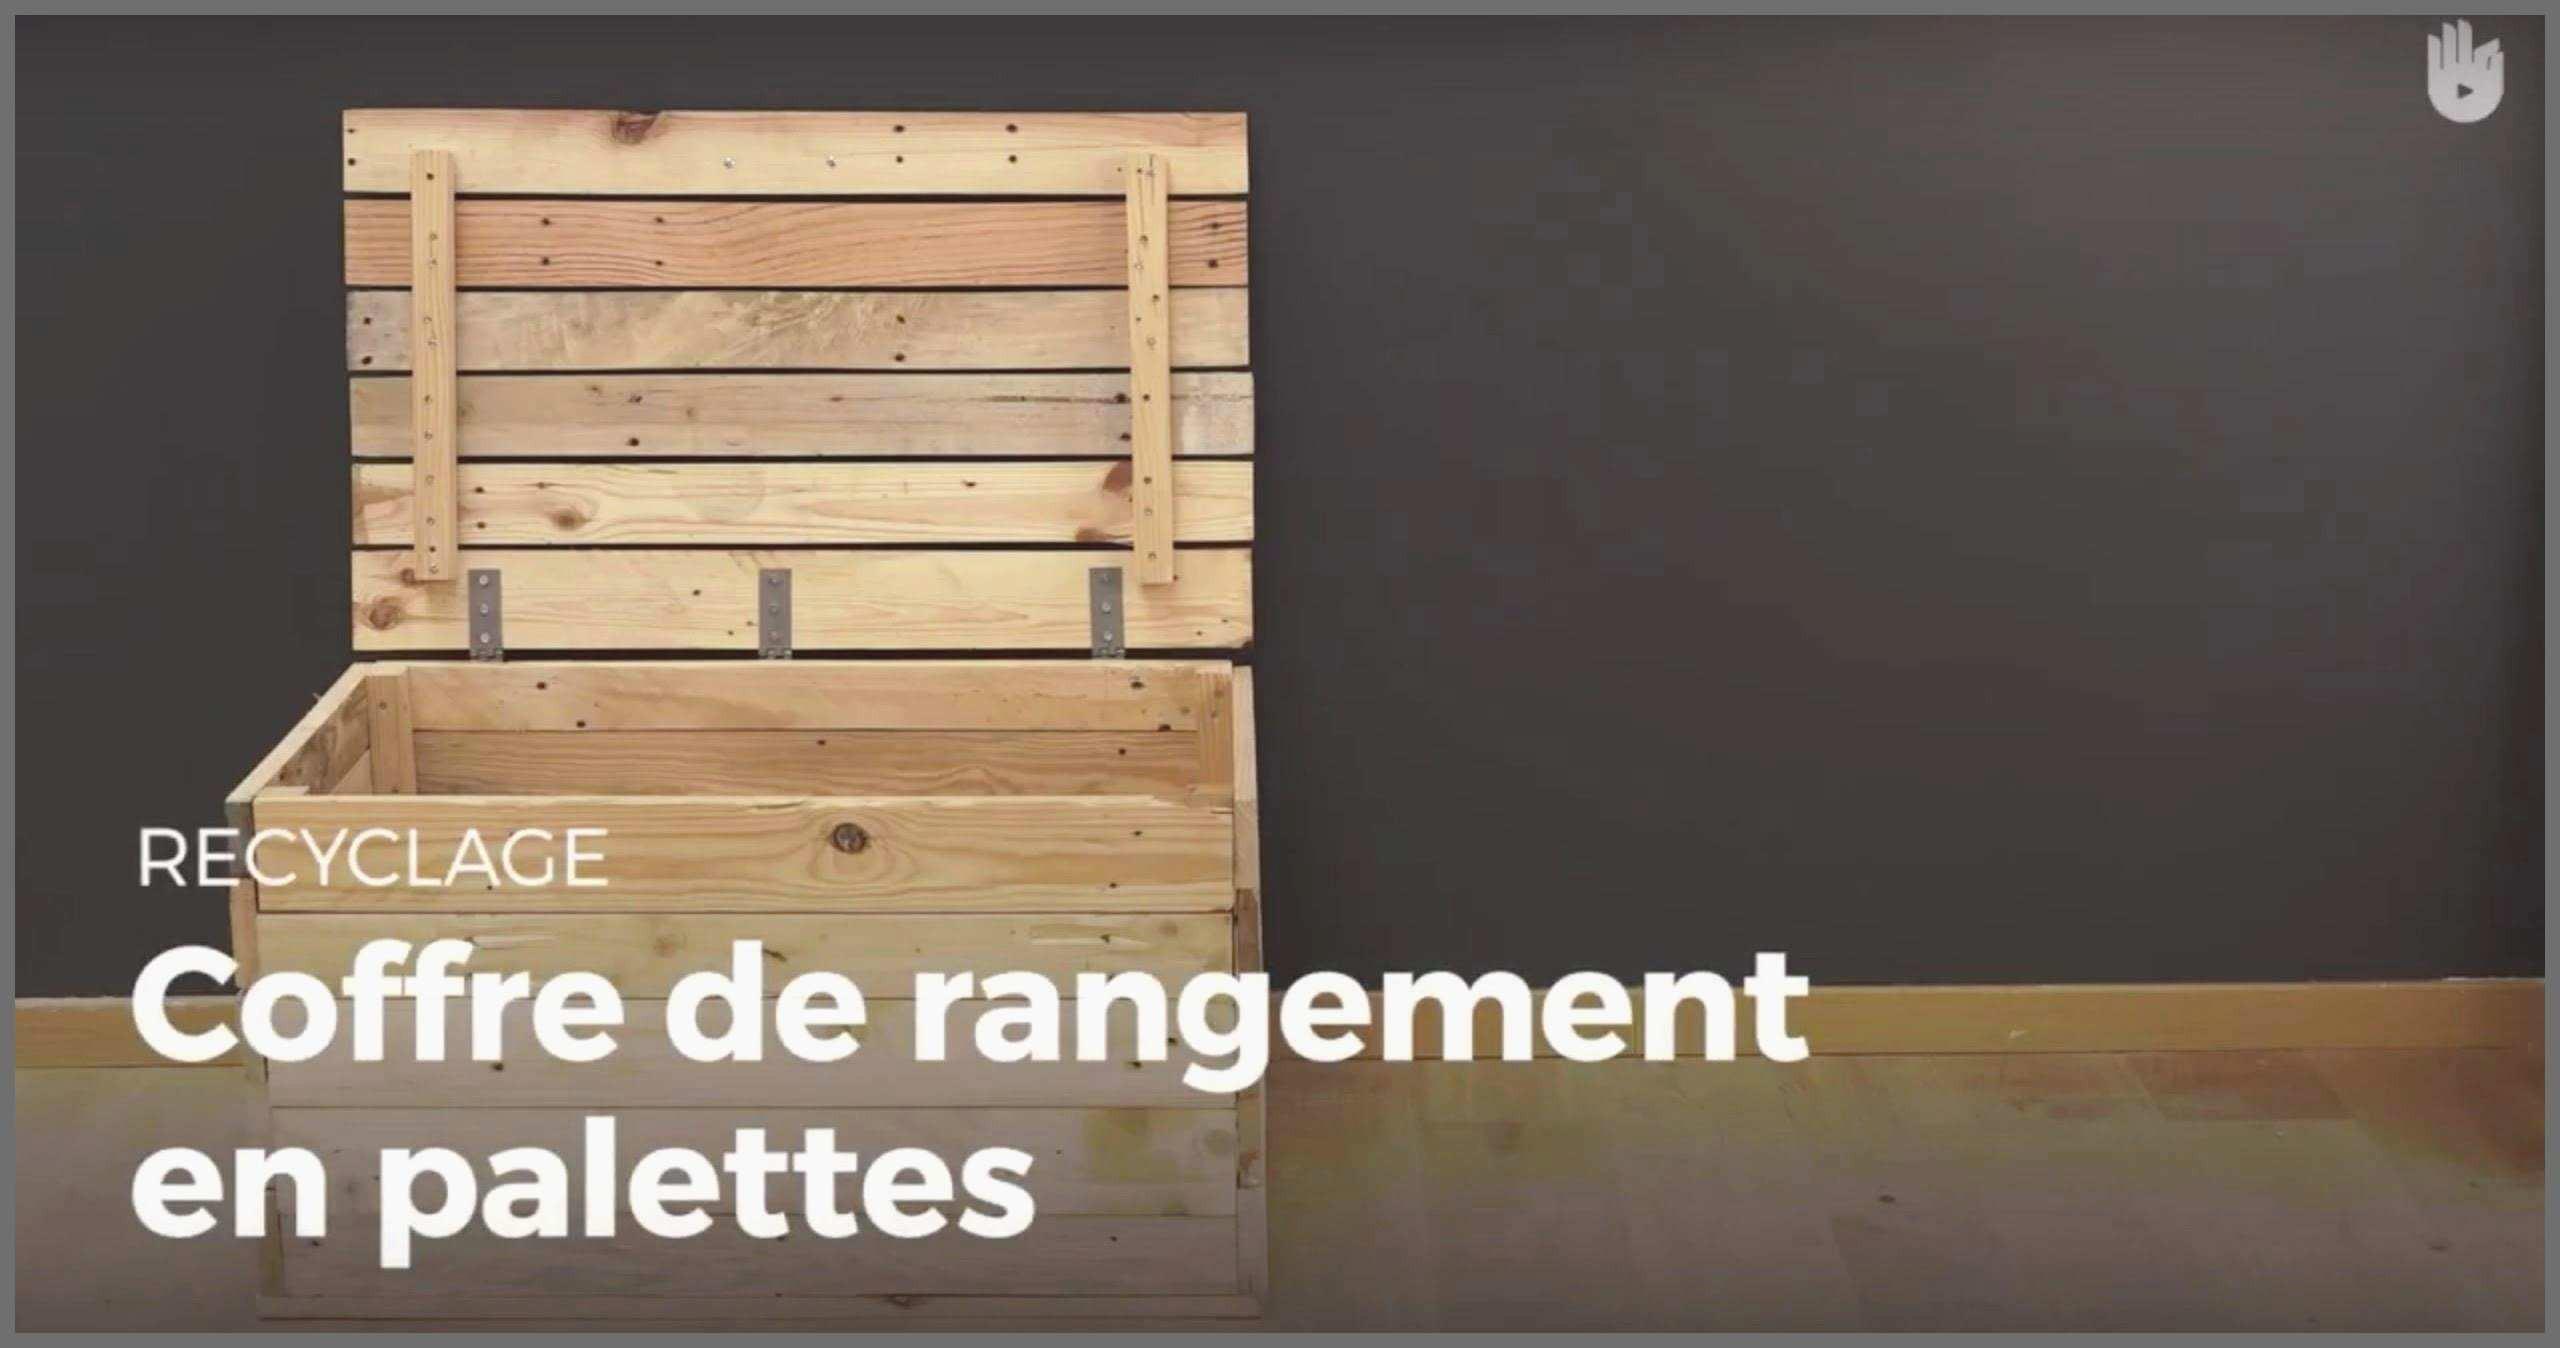 Coffre Rangement Jardin Castorama Archives Agencecormierdelauniere Com Agencecormierdelauniere Com